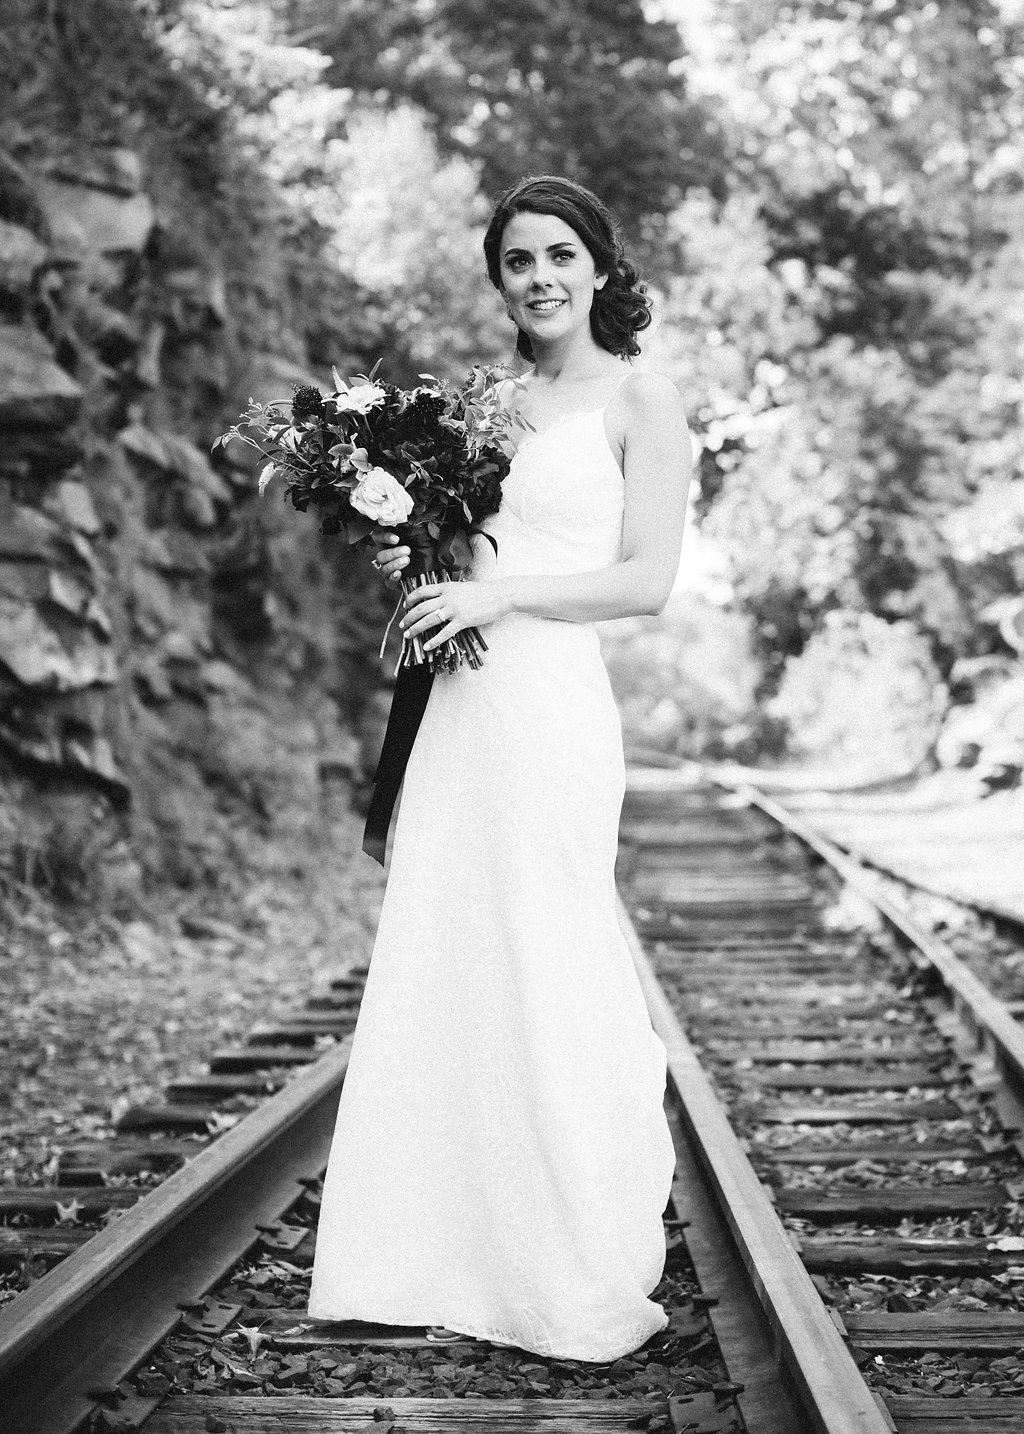 bride in wedding dress on railroad tracks